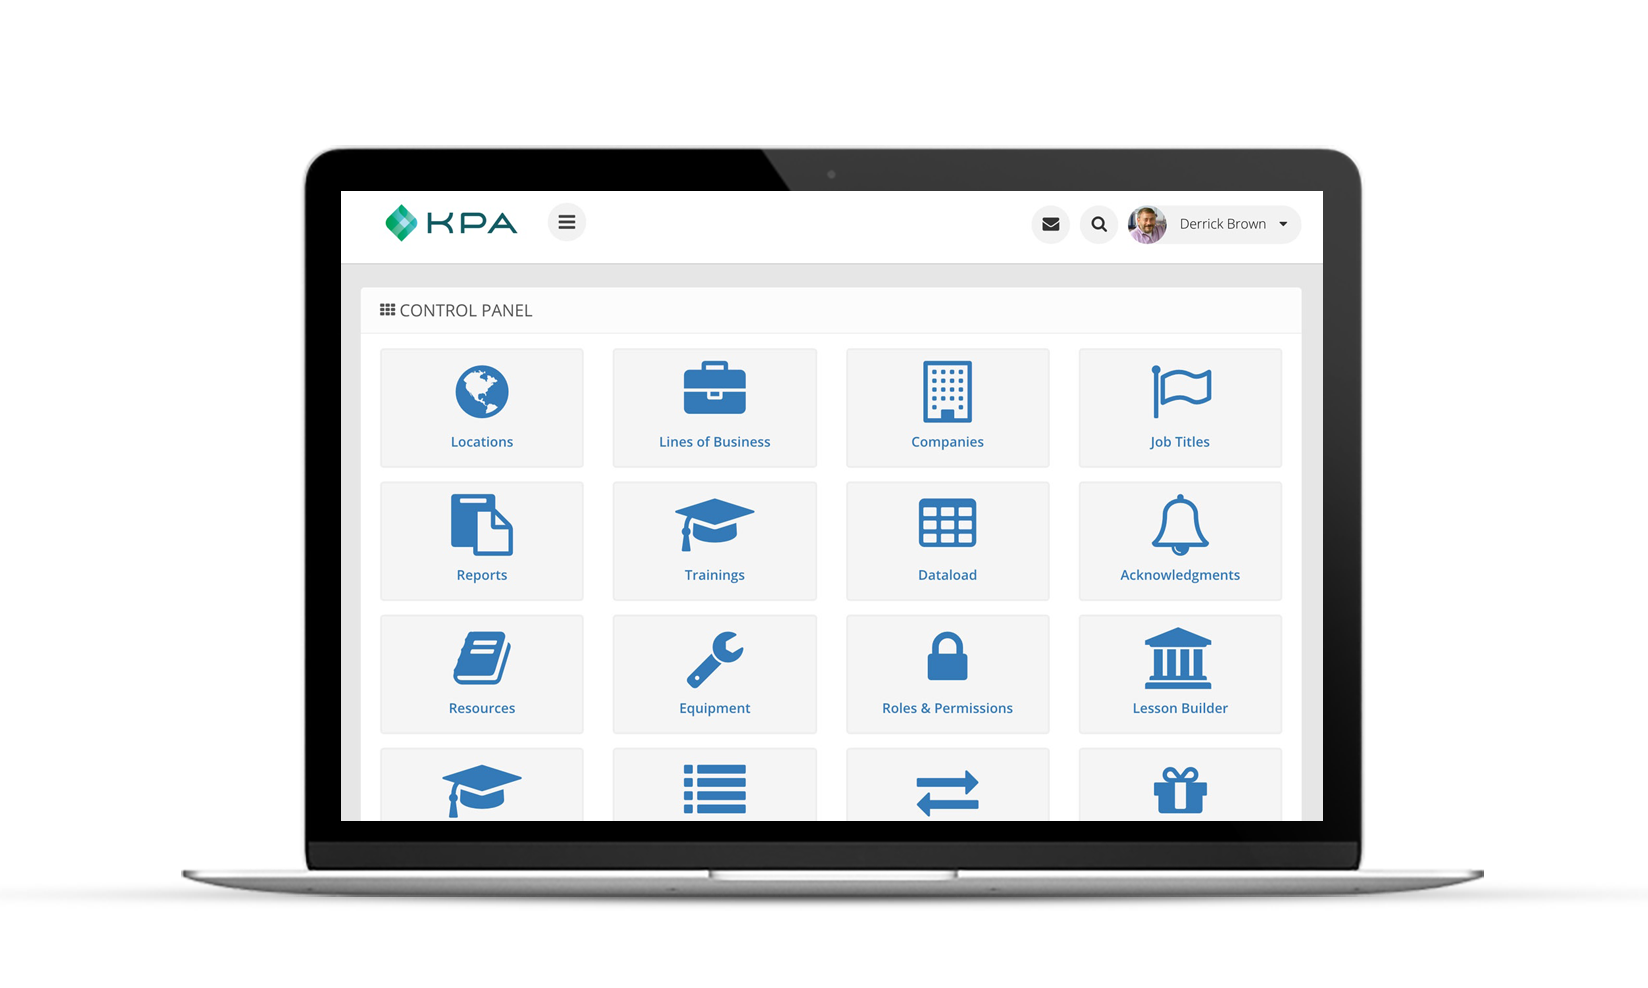 KPA EHS Control Panel